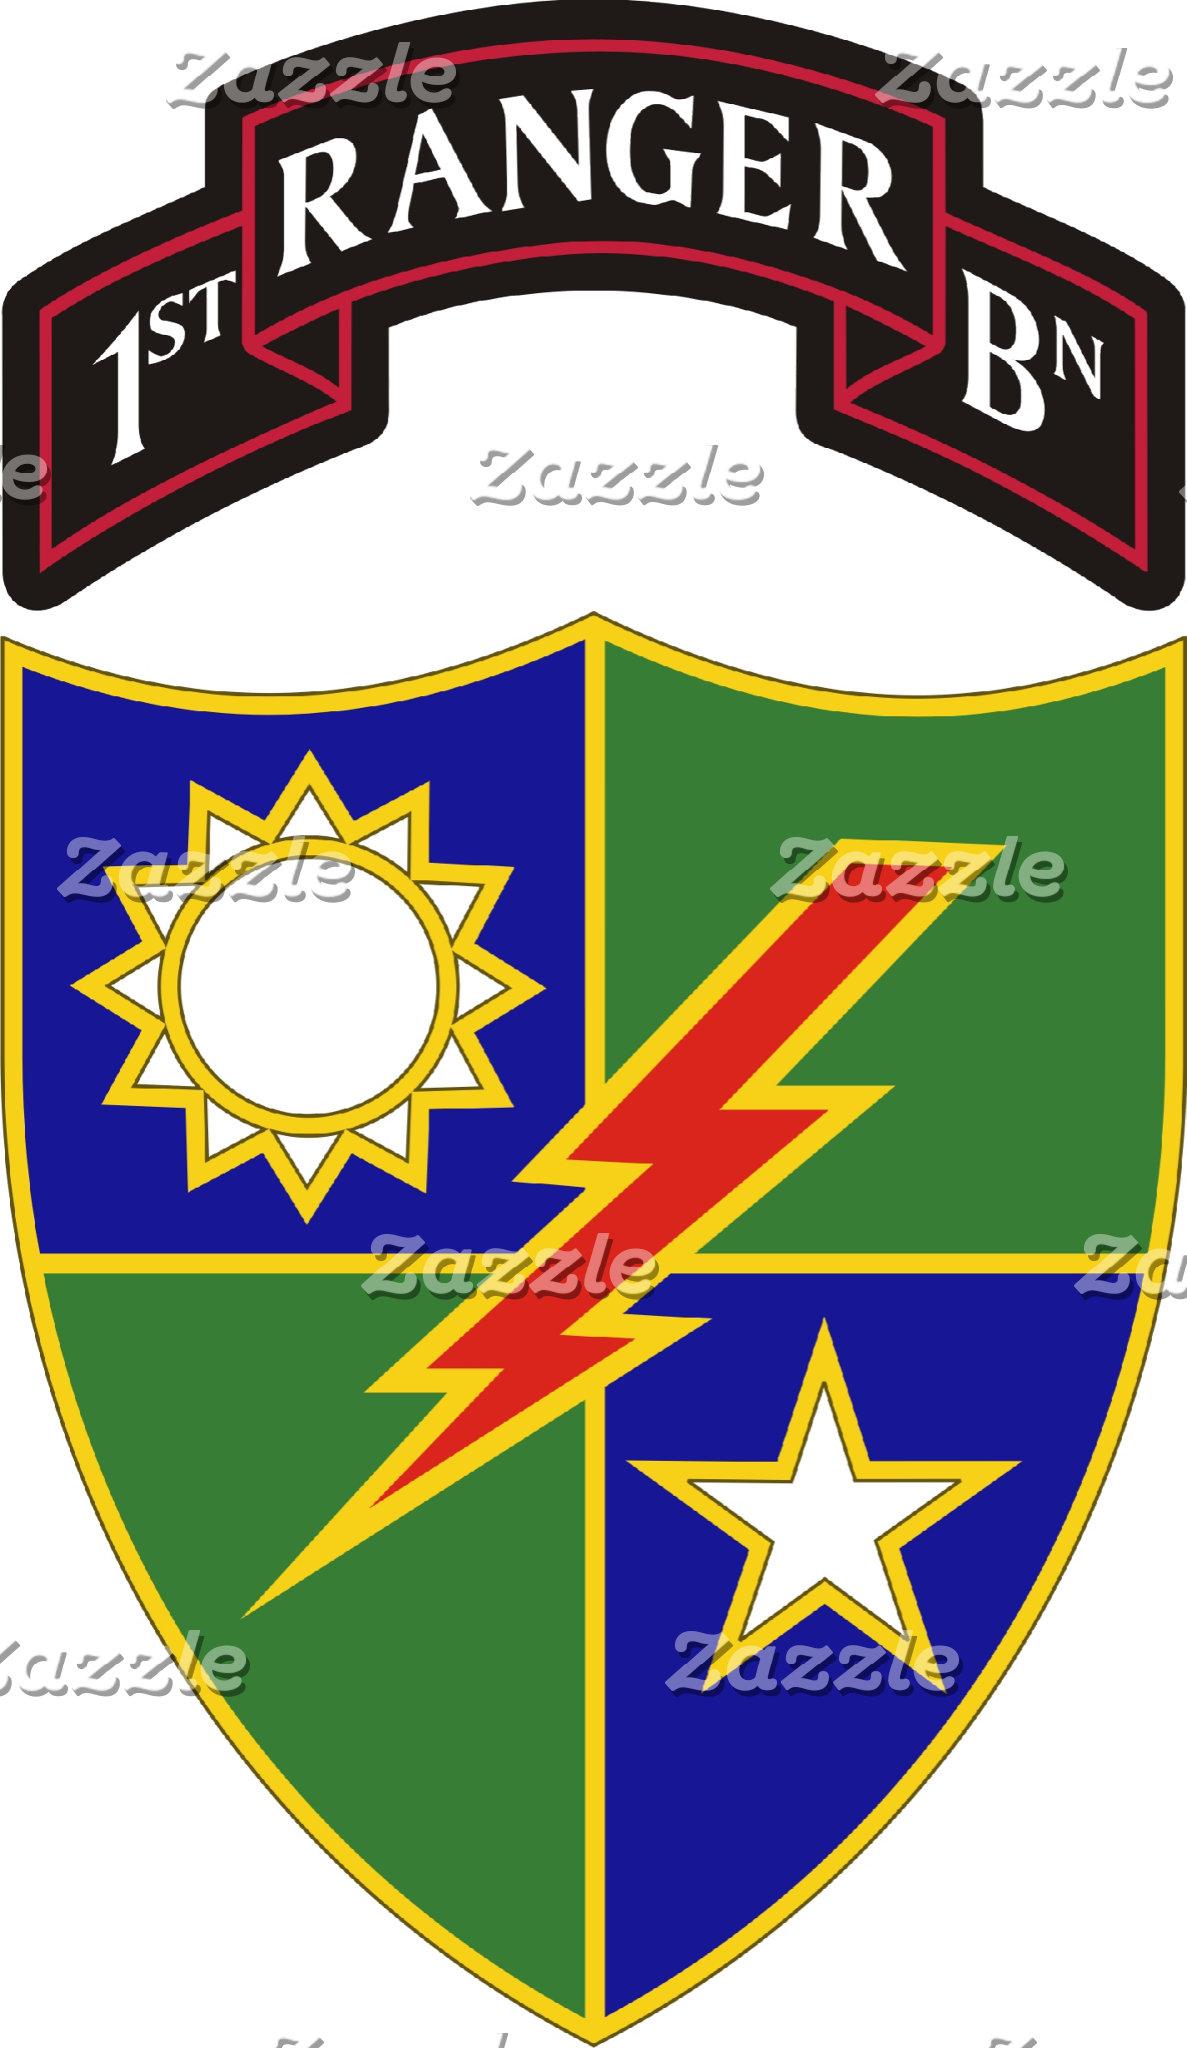 1st Battalion - 75th Ranger Regiment